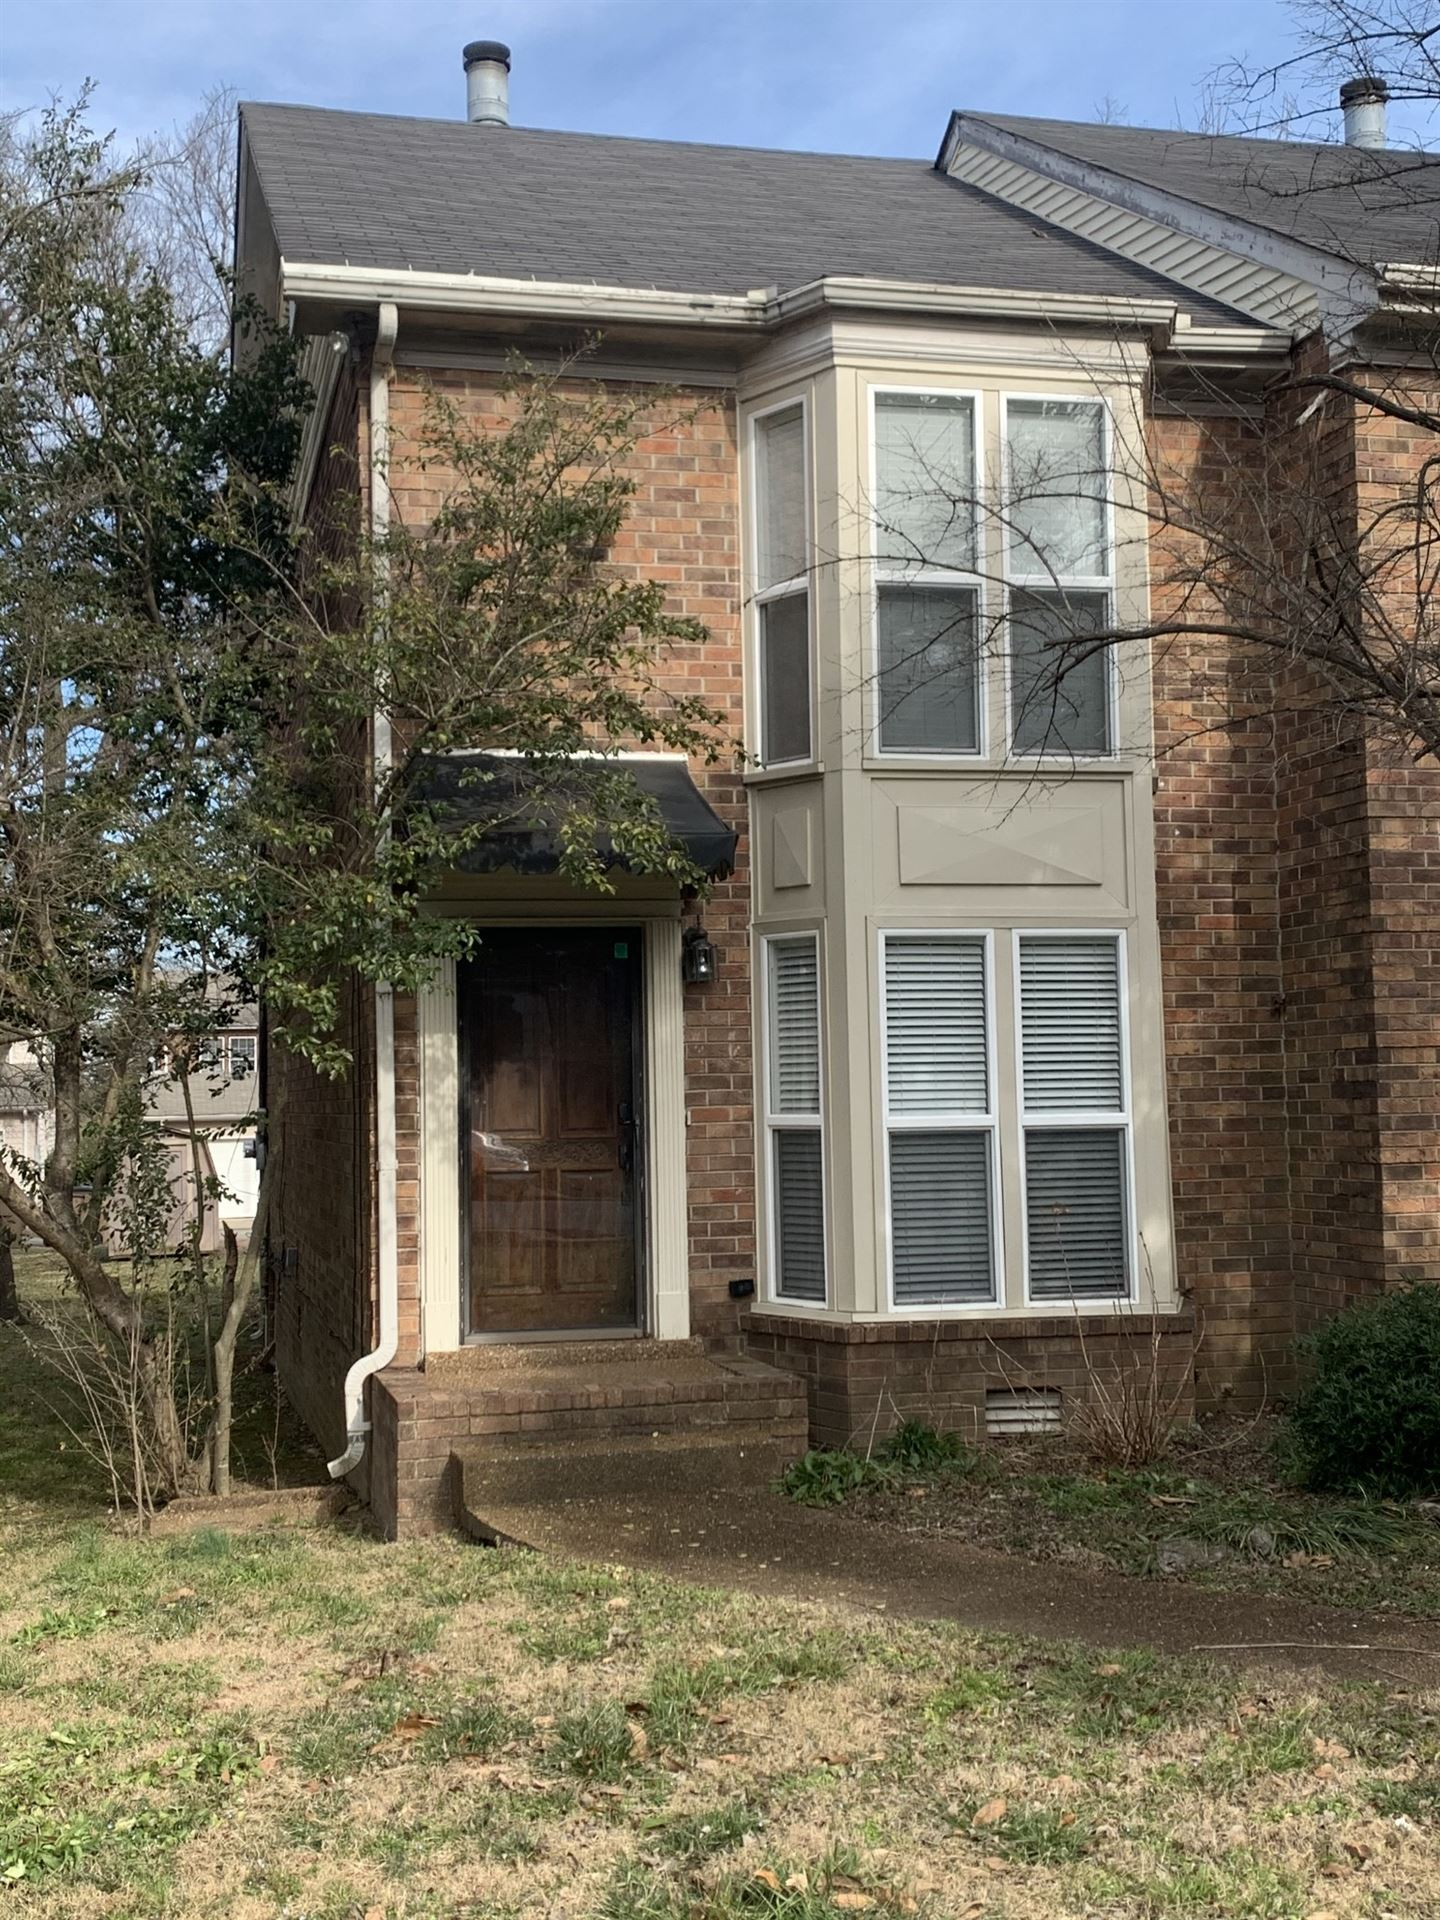 2702B Acklen Ave #2702 B, Nashville, TN 37212 - MLS#: 2222699